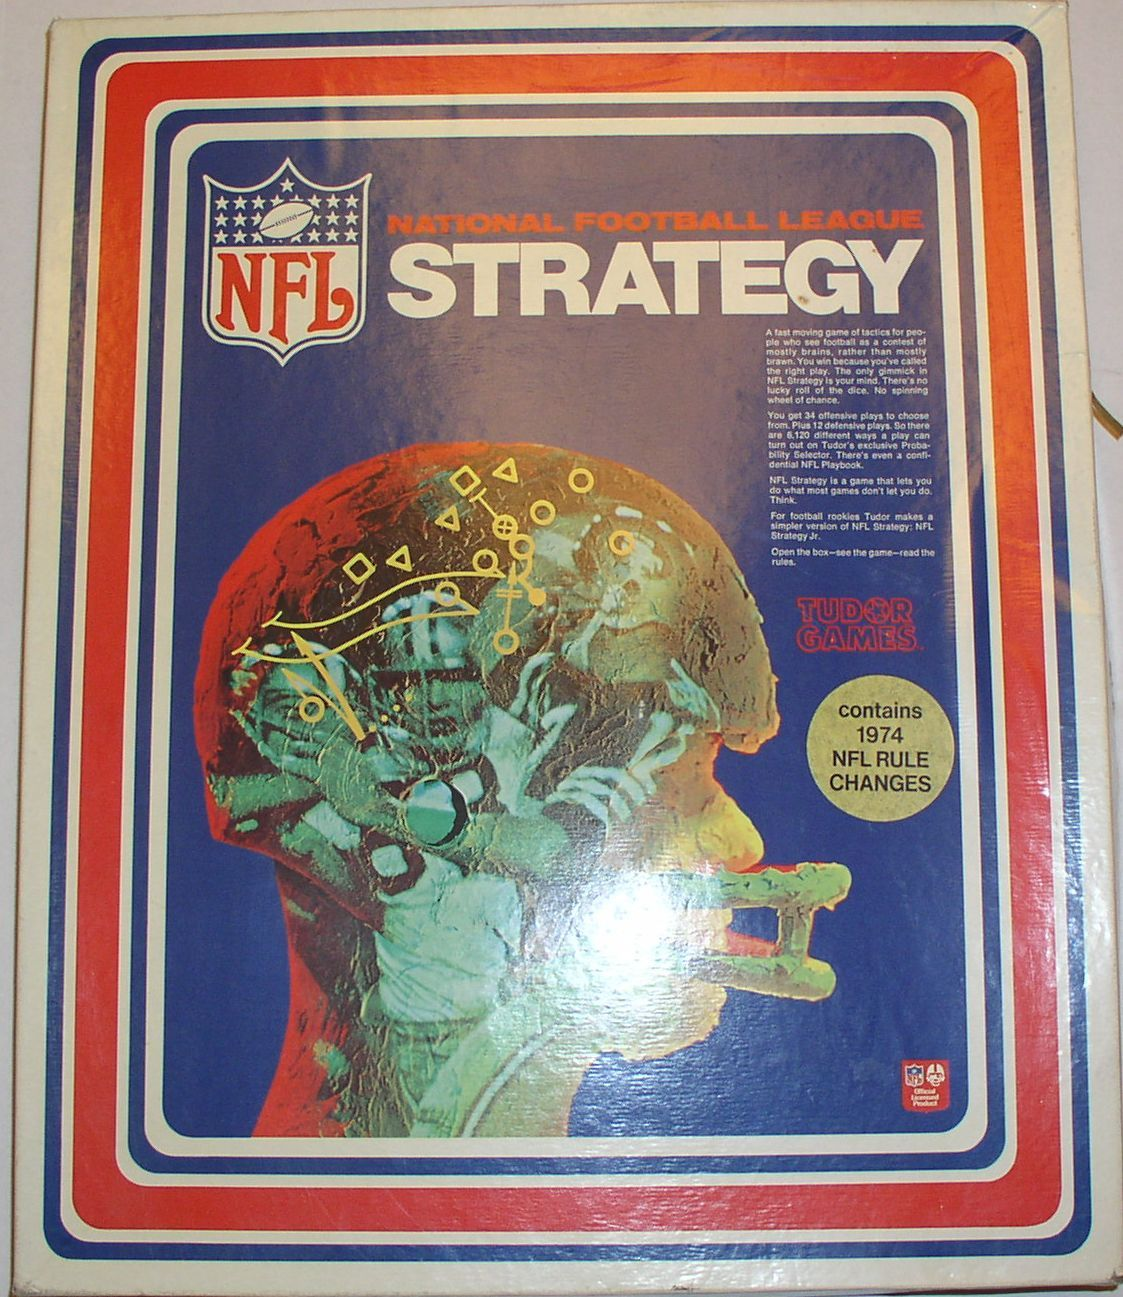 Nfl trading strategies